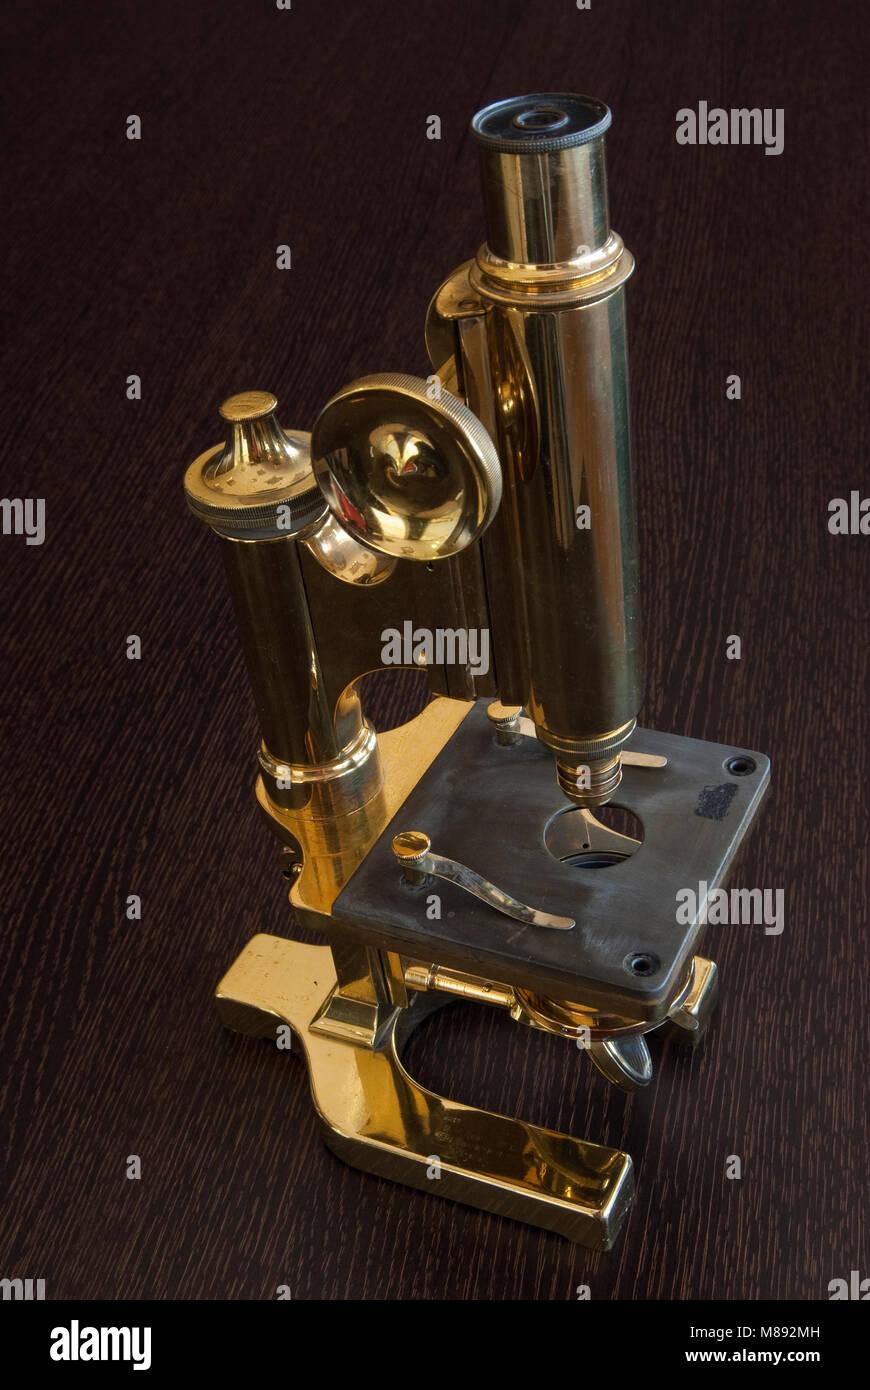 Old microscope, medicine - Stock Image